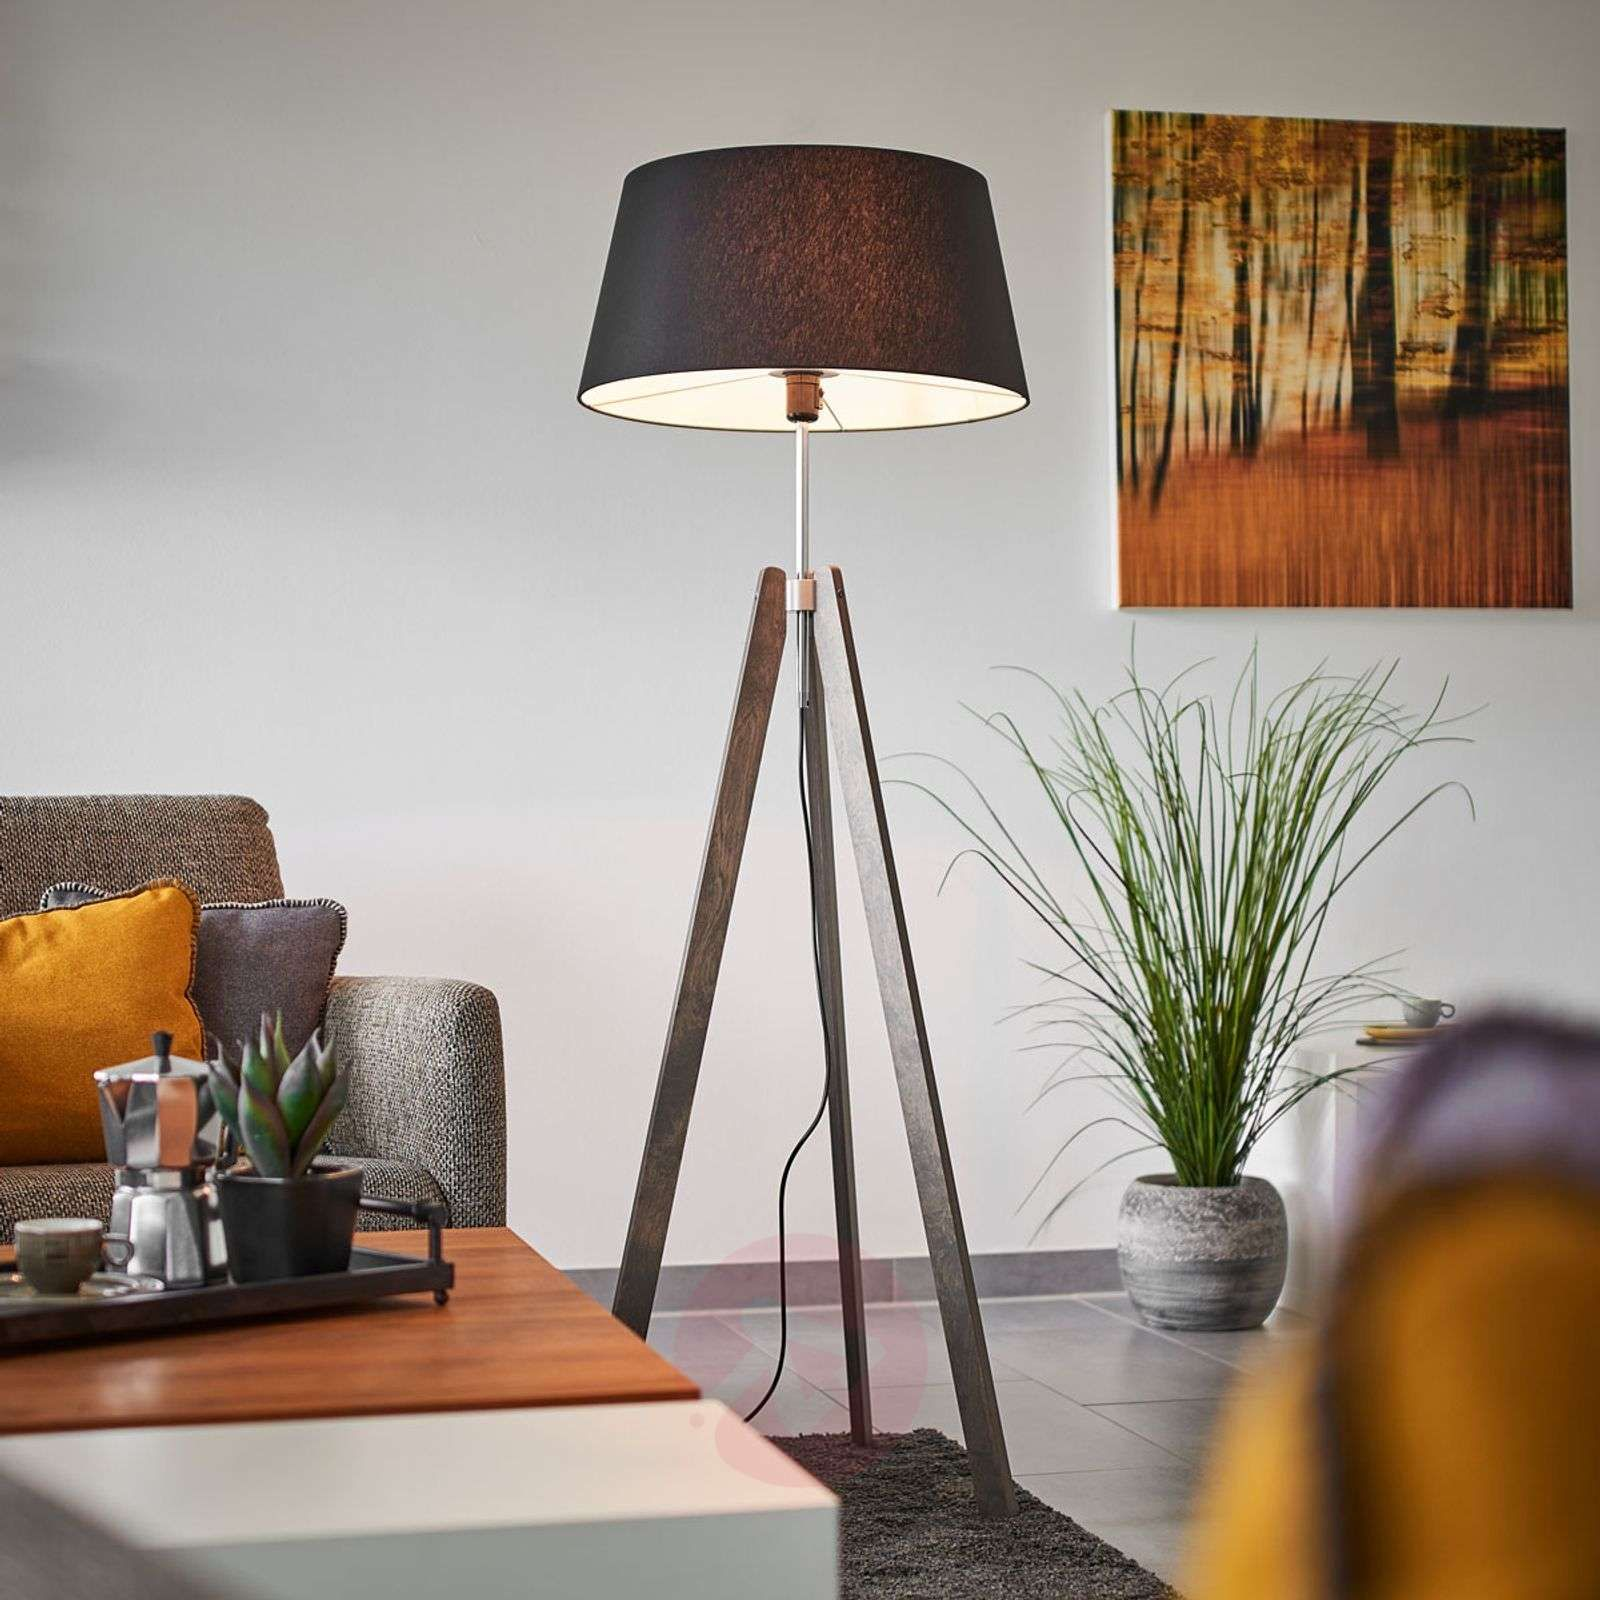 Thea Drewniana Lampa Stojaca Czarny Chintz In 2020 With Images Lampy Lampki Nocne Lampa Podlogowa